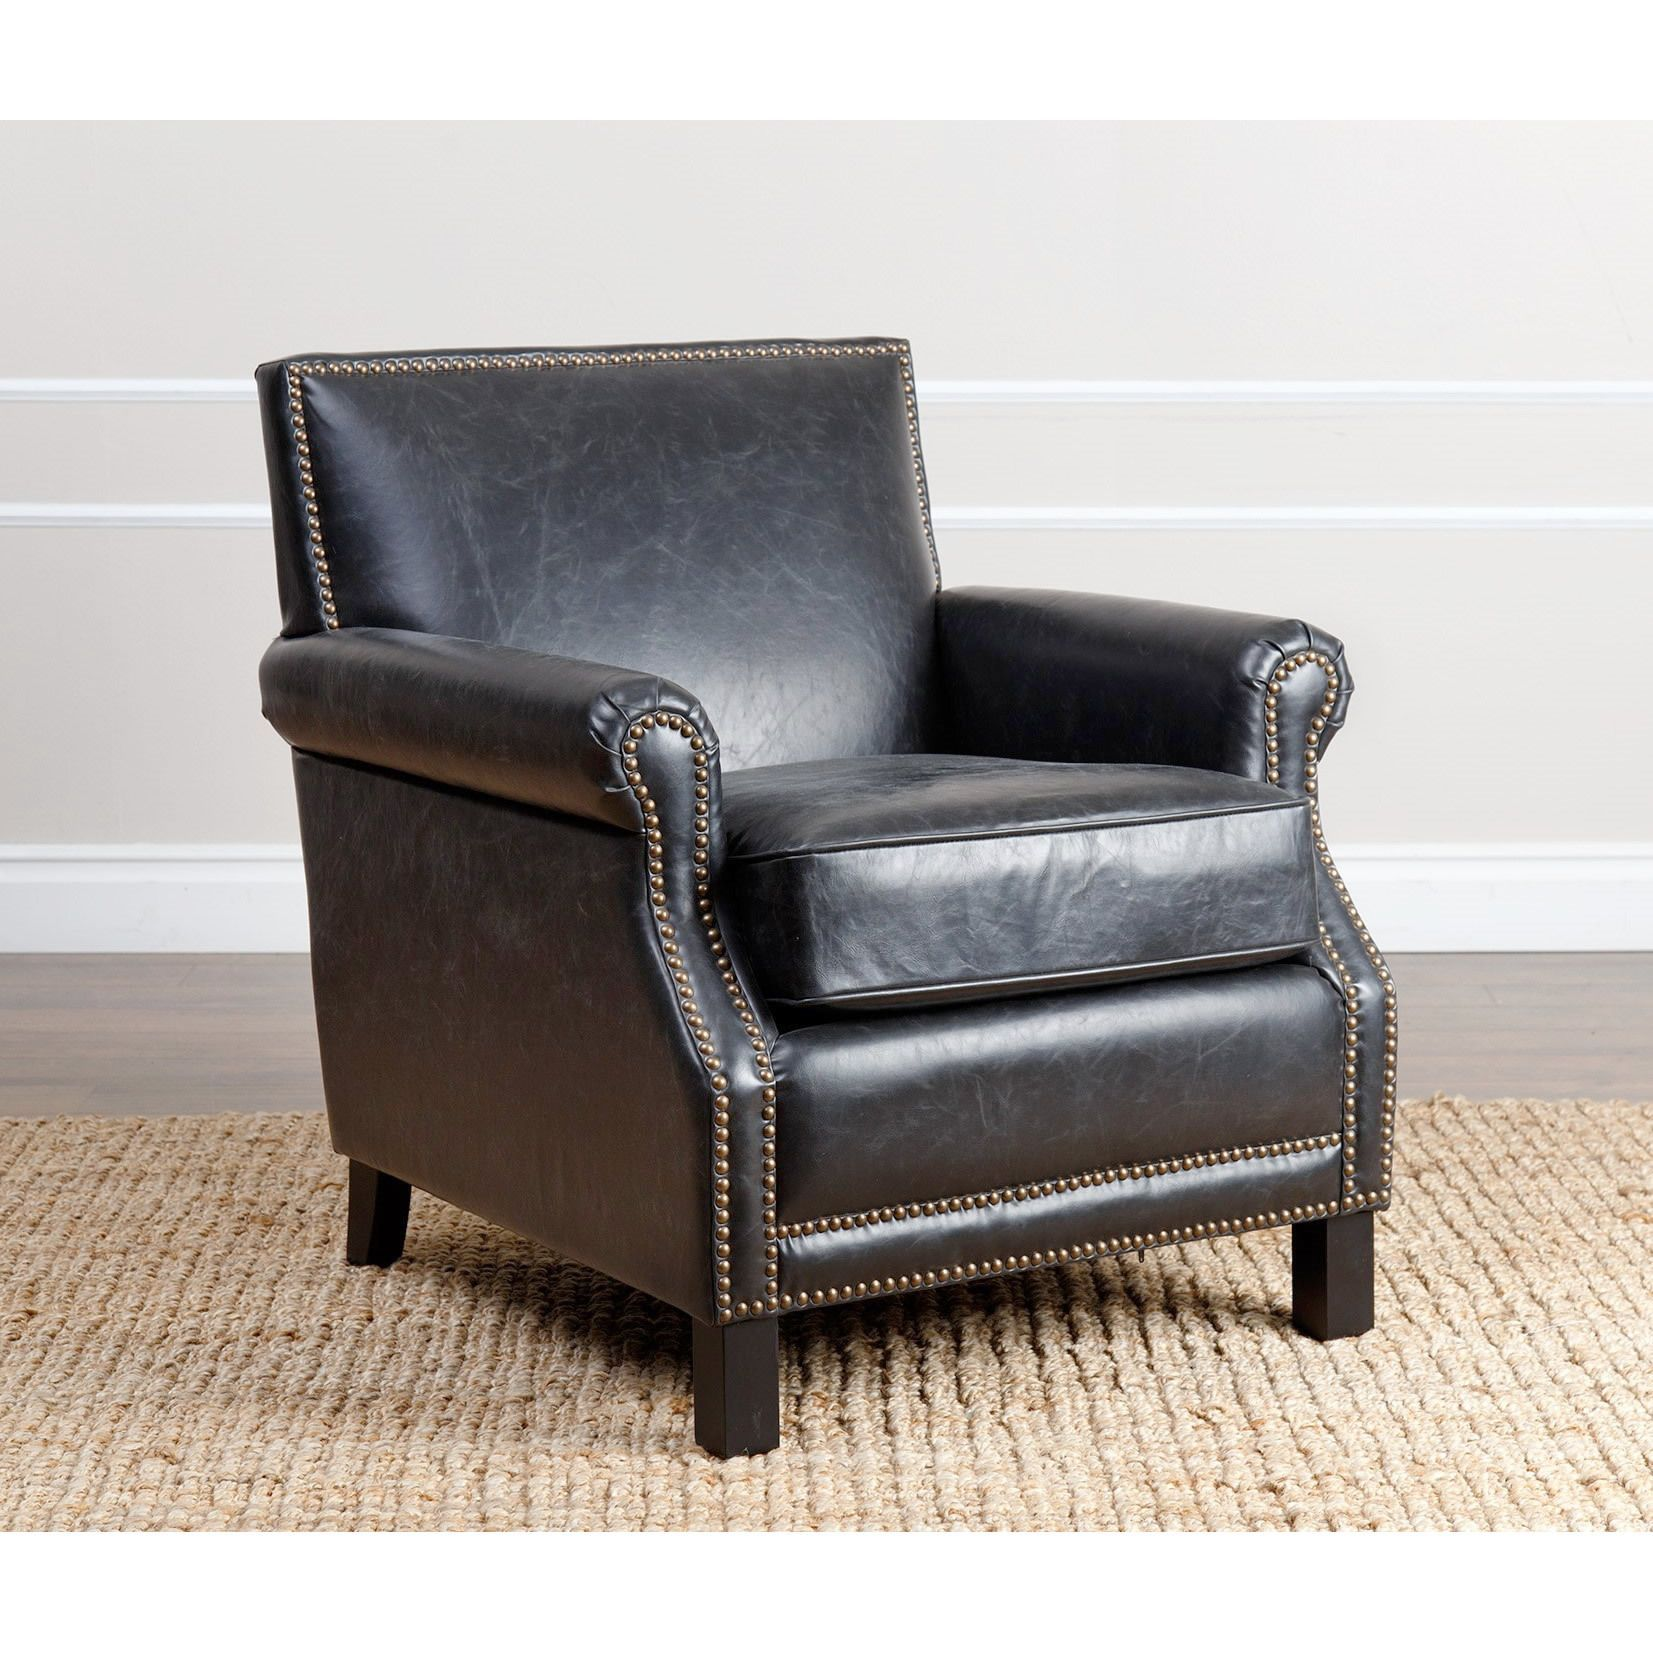 Abbyson Chloe Antique Black Leather Club Chair by Abbyson